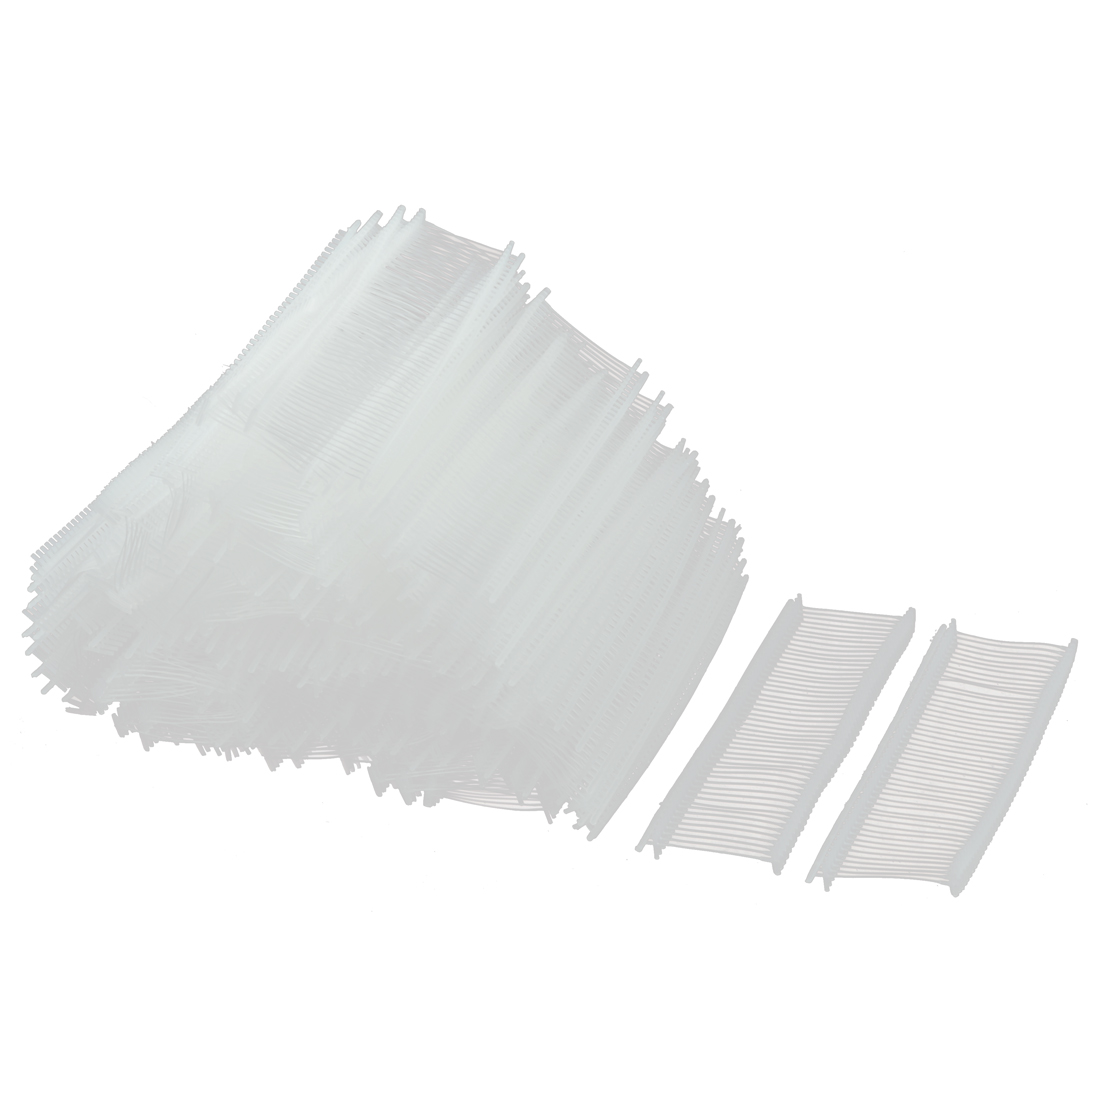 Plastic Snap Lock Security Loop Tag Fastener White 25mm Inner Dia 5000 Pcs